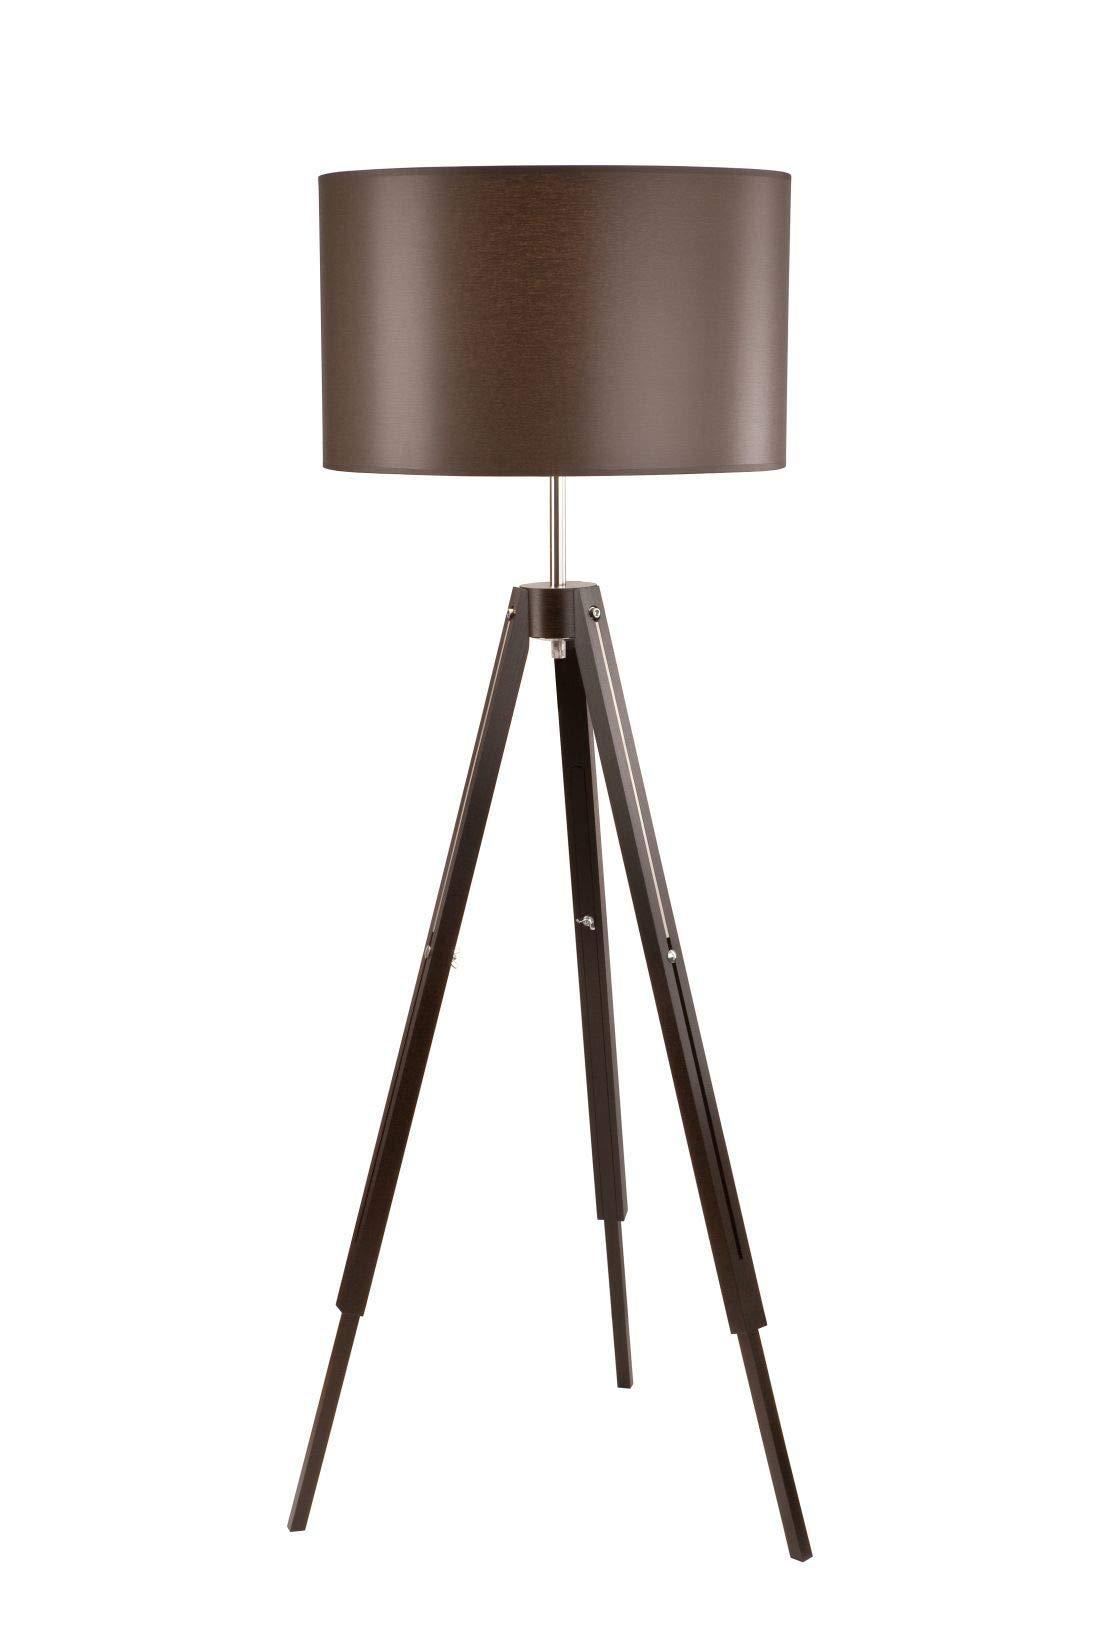 EGLO 49156 Lámpara de pie Braun Weiss 60 W